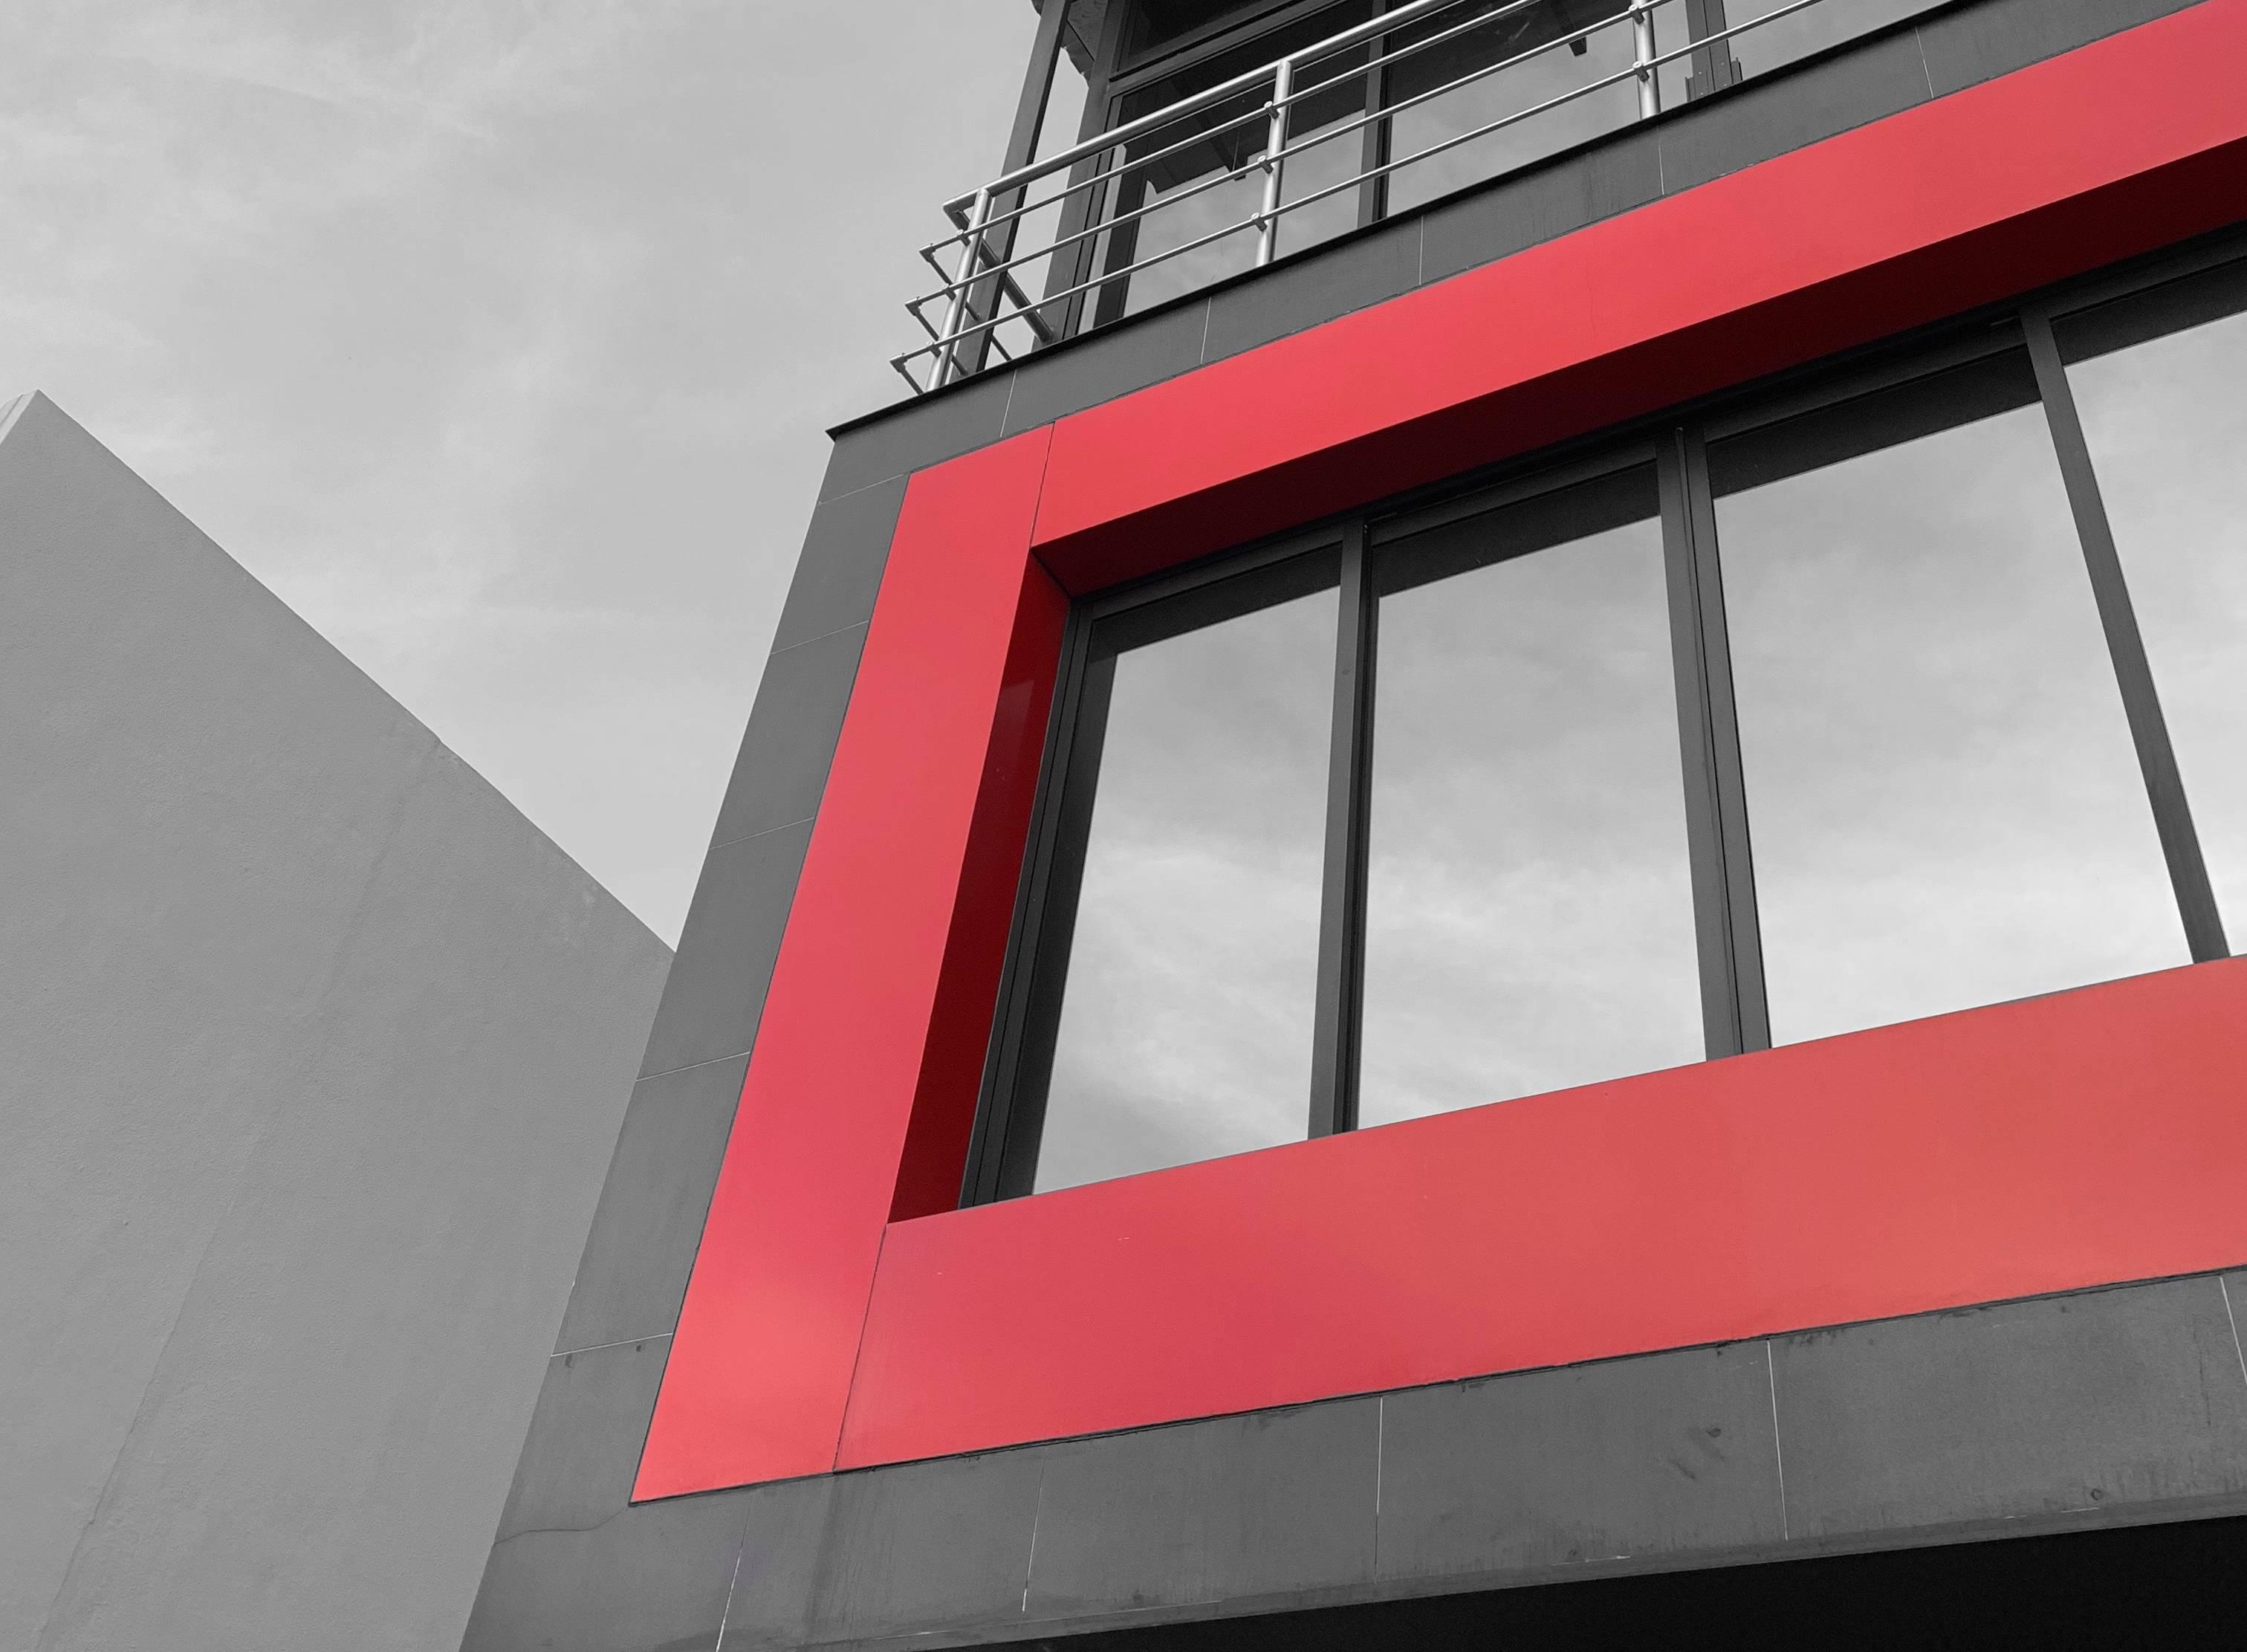 ffelix architecture